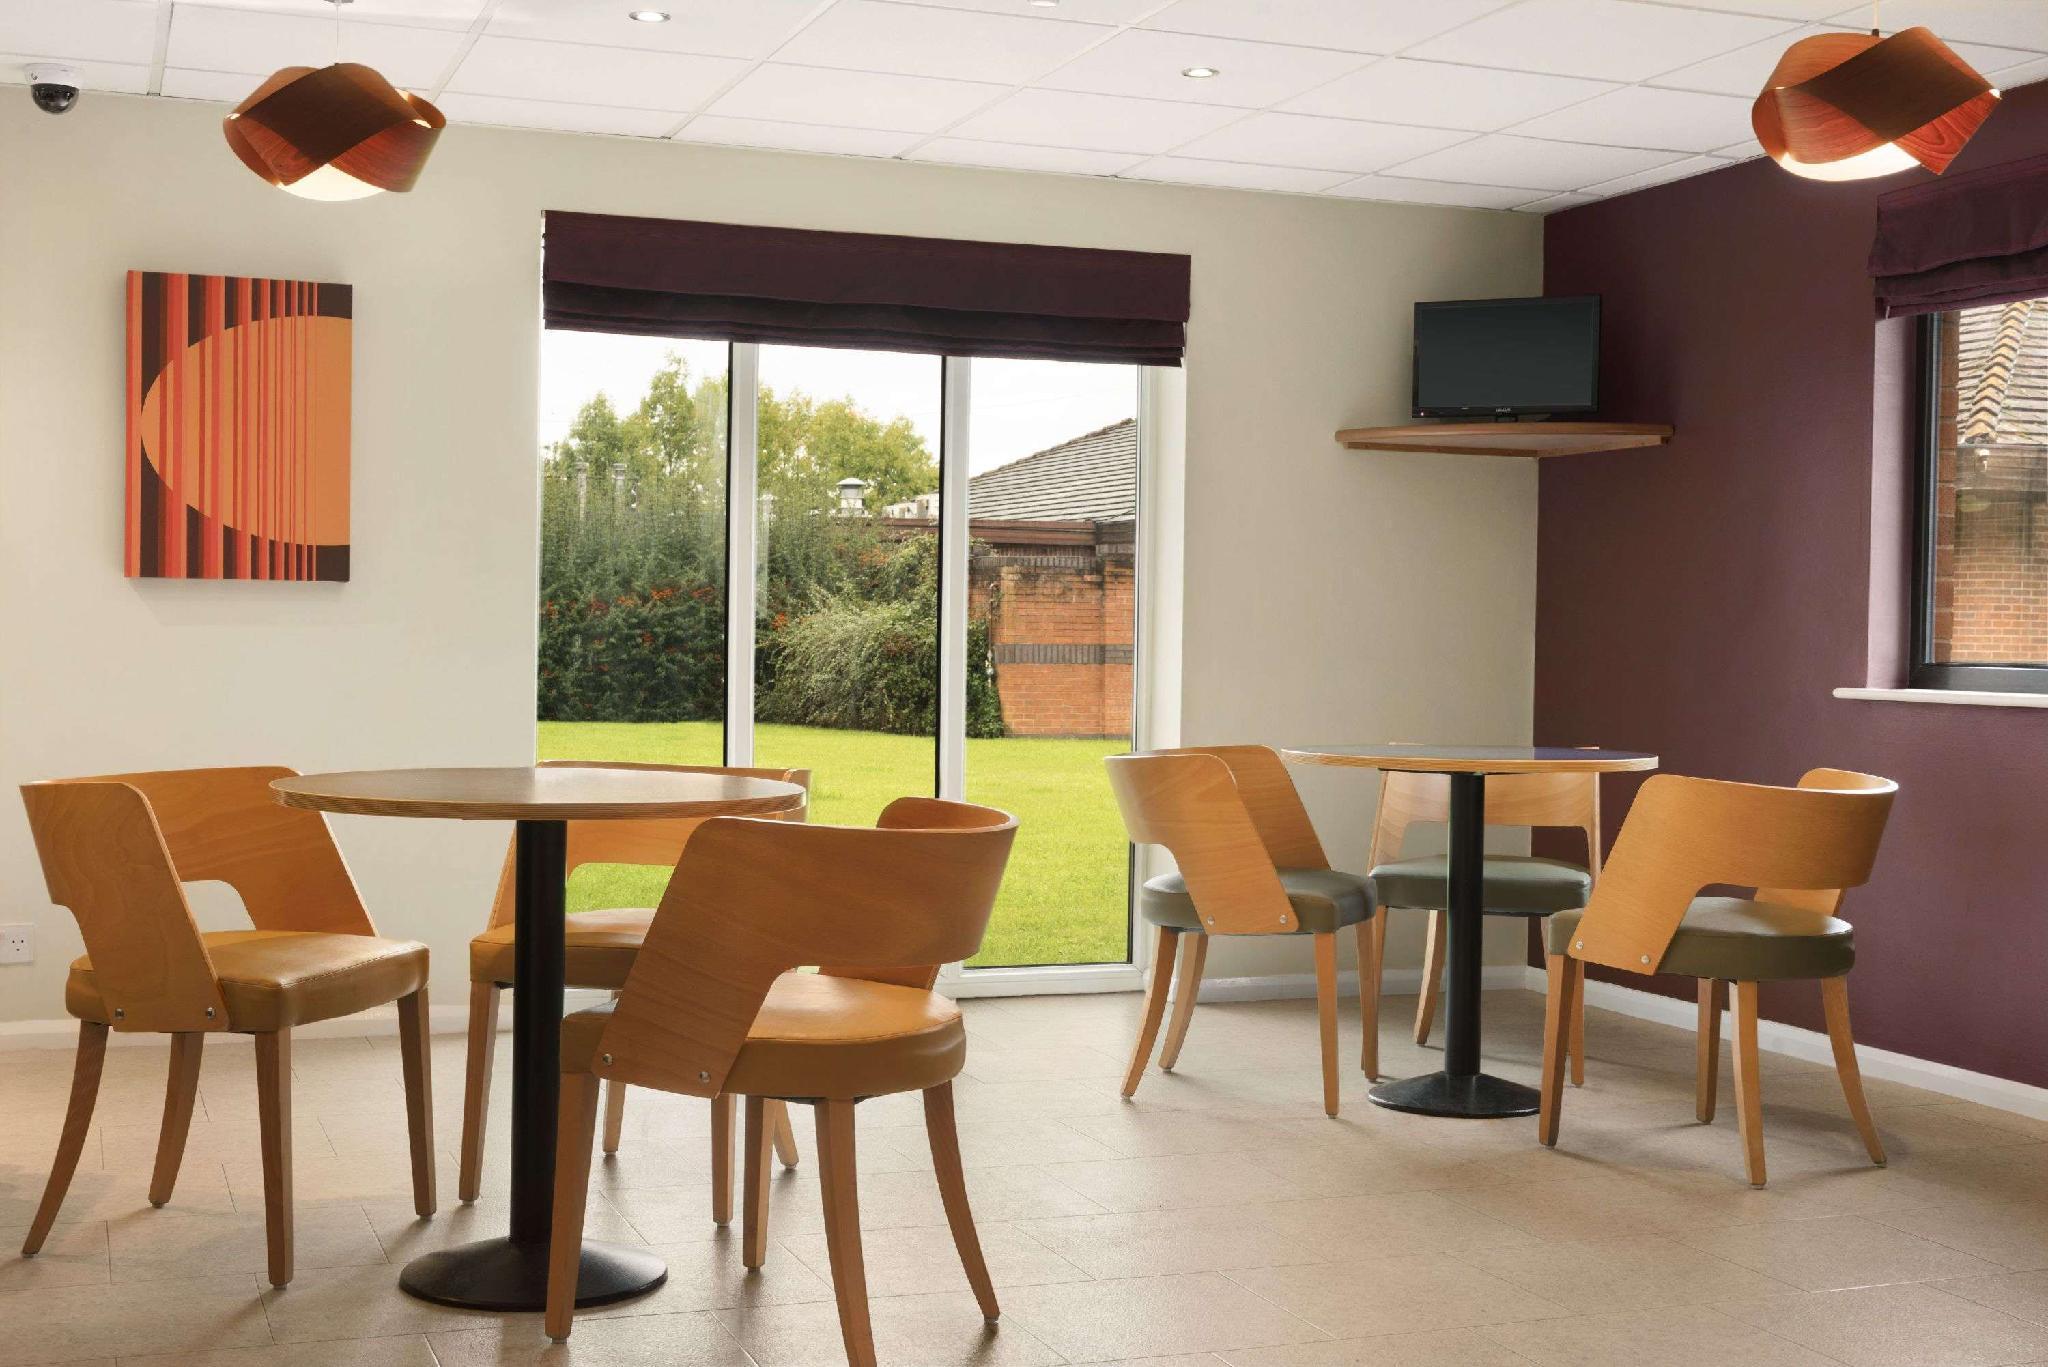 Days Inn Warwick North M40 Reviews